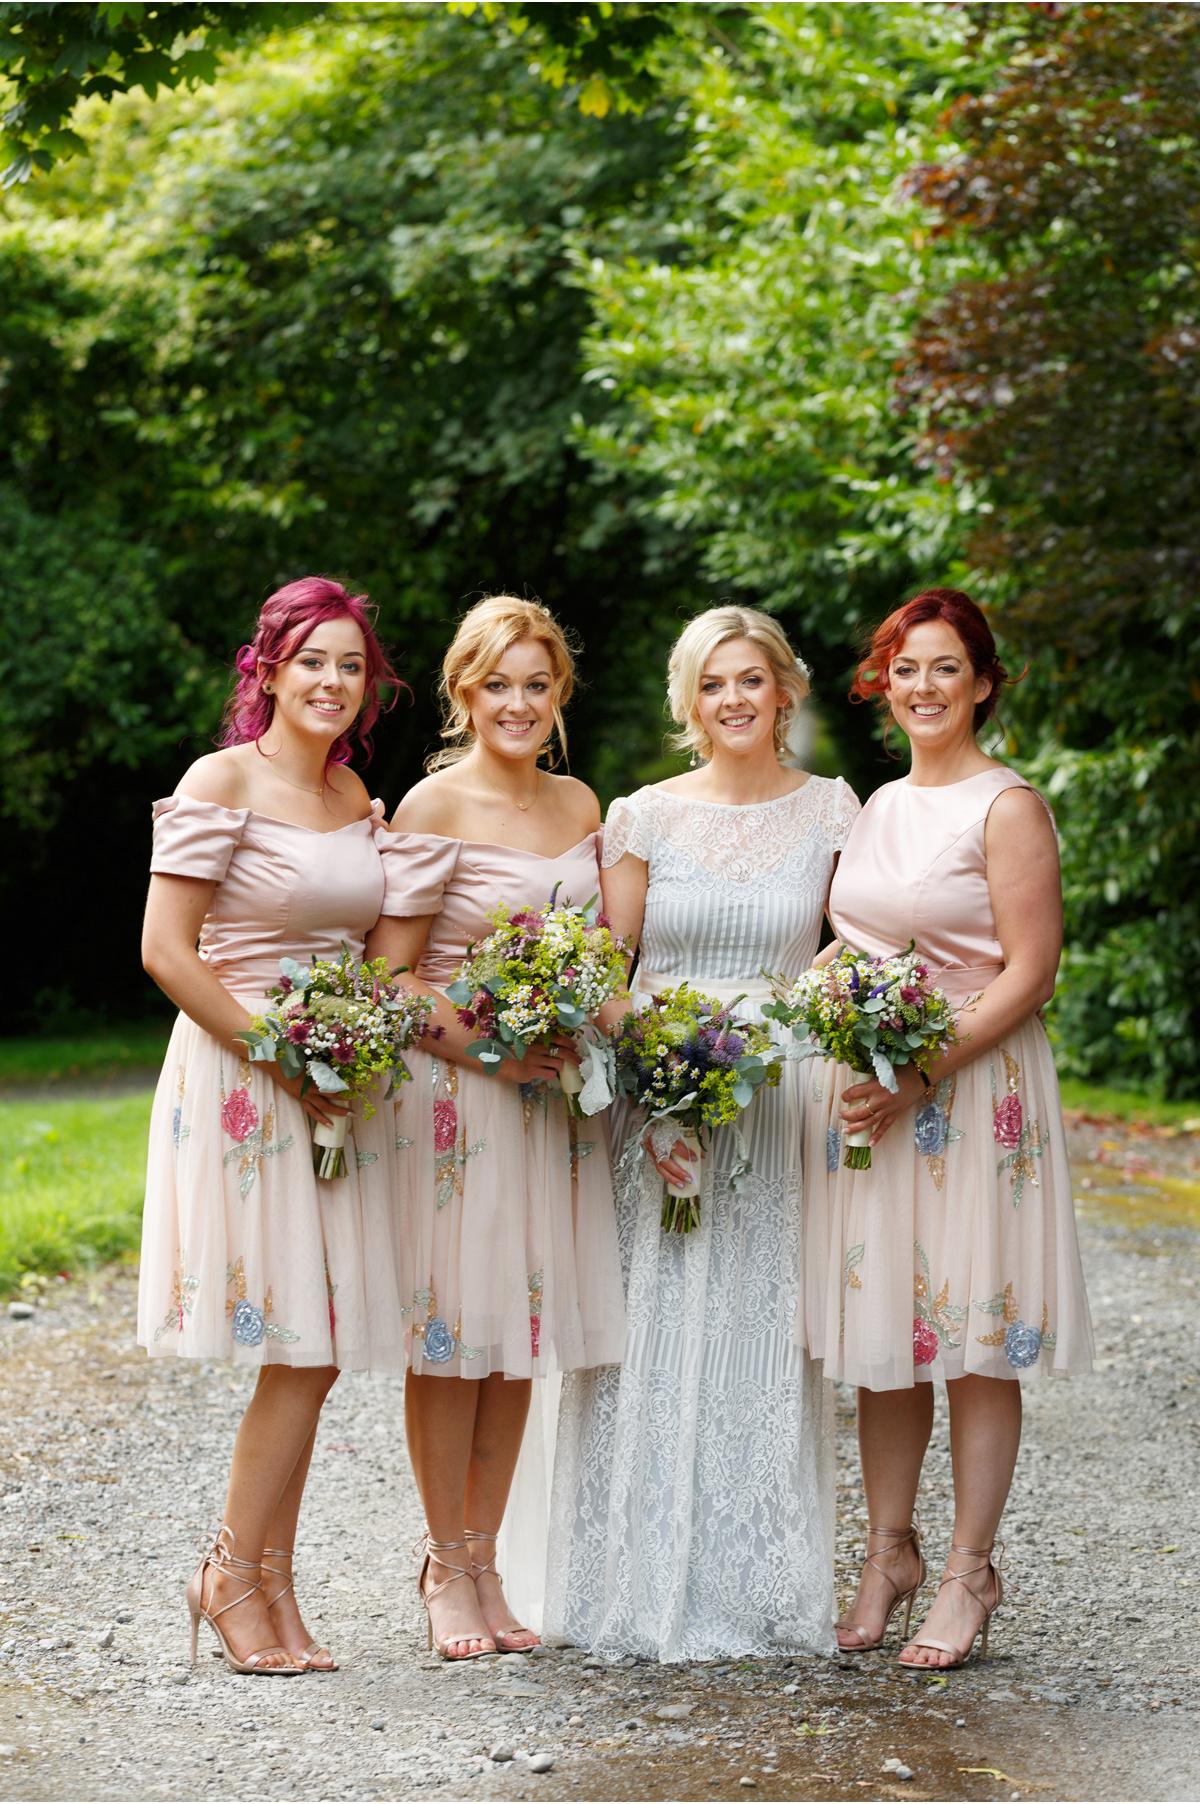 peach feminine bridesmaids 2 piece